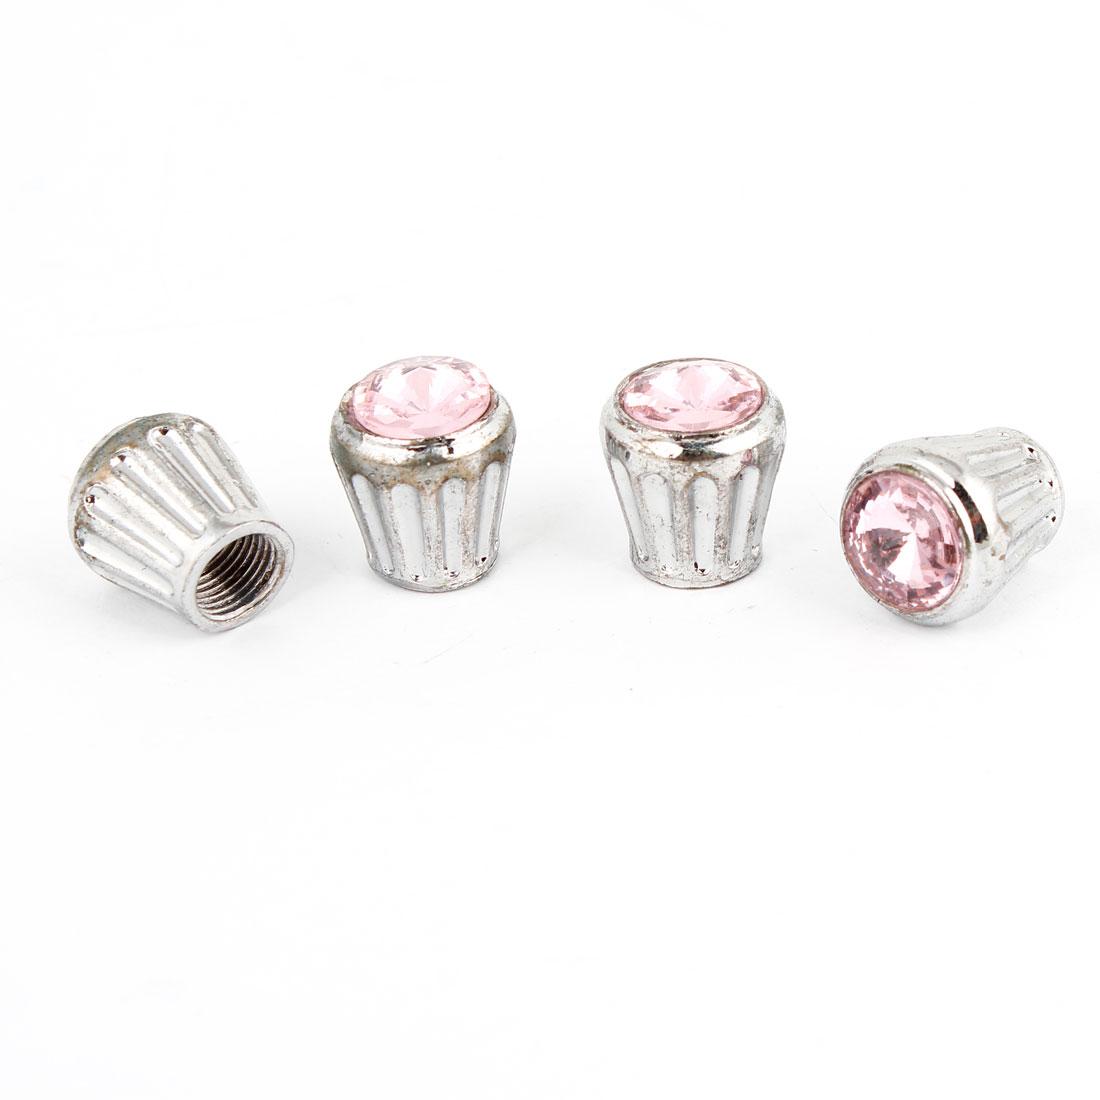 4 Pcs Pink Faux Rhinestone Detail Auto Car Tire Valve Cap Cover 7mm Inner Dia